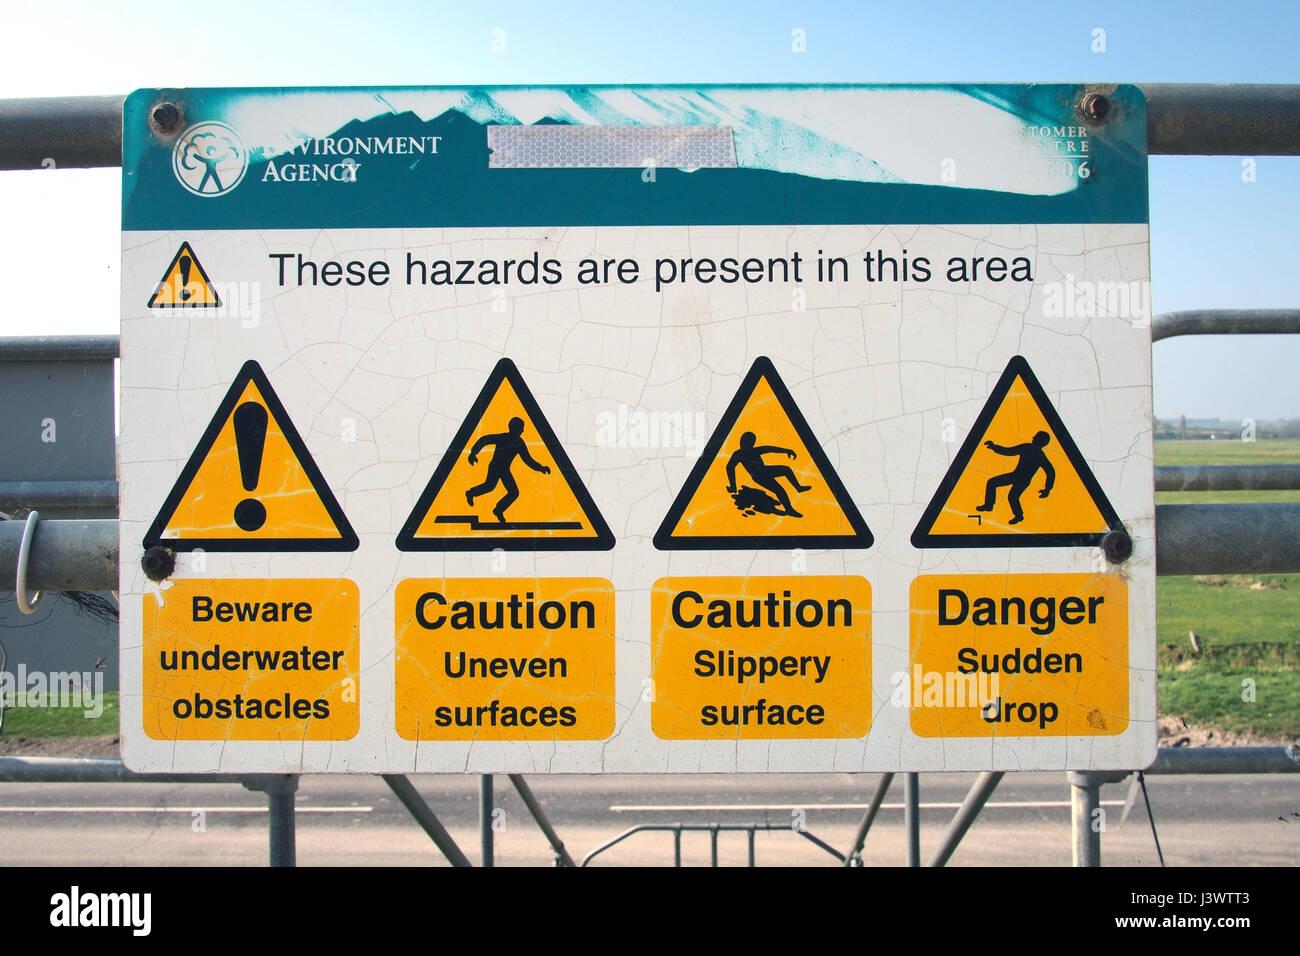 Health & Safety Hazards warning sign - Stock Image